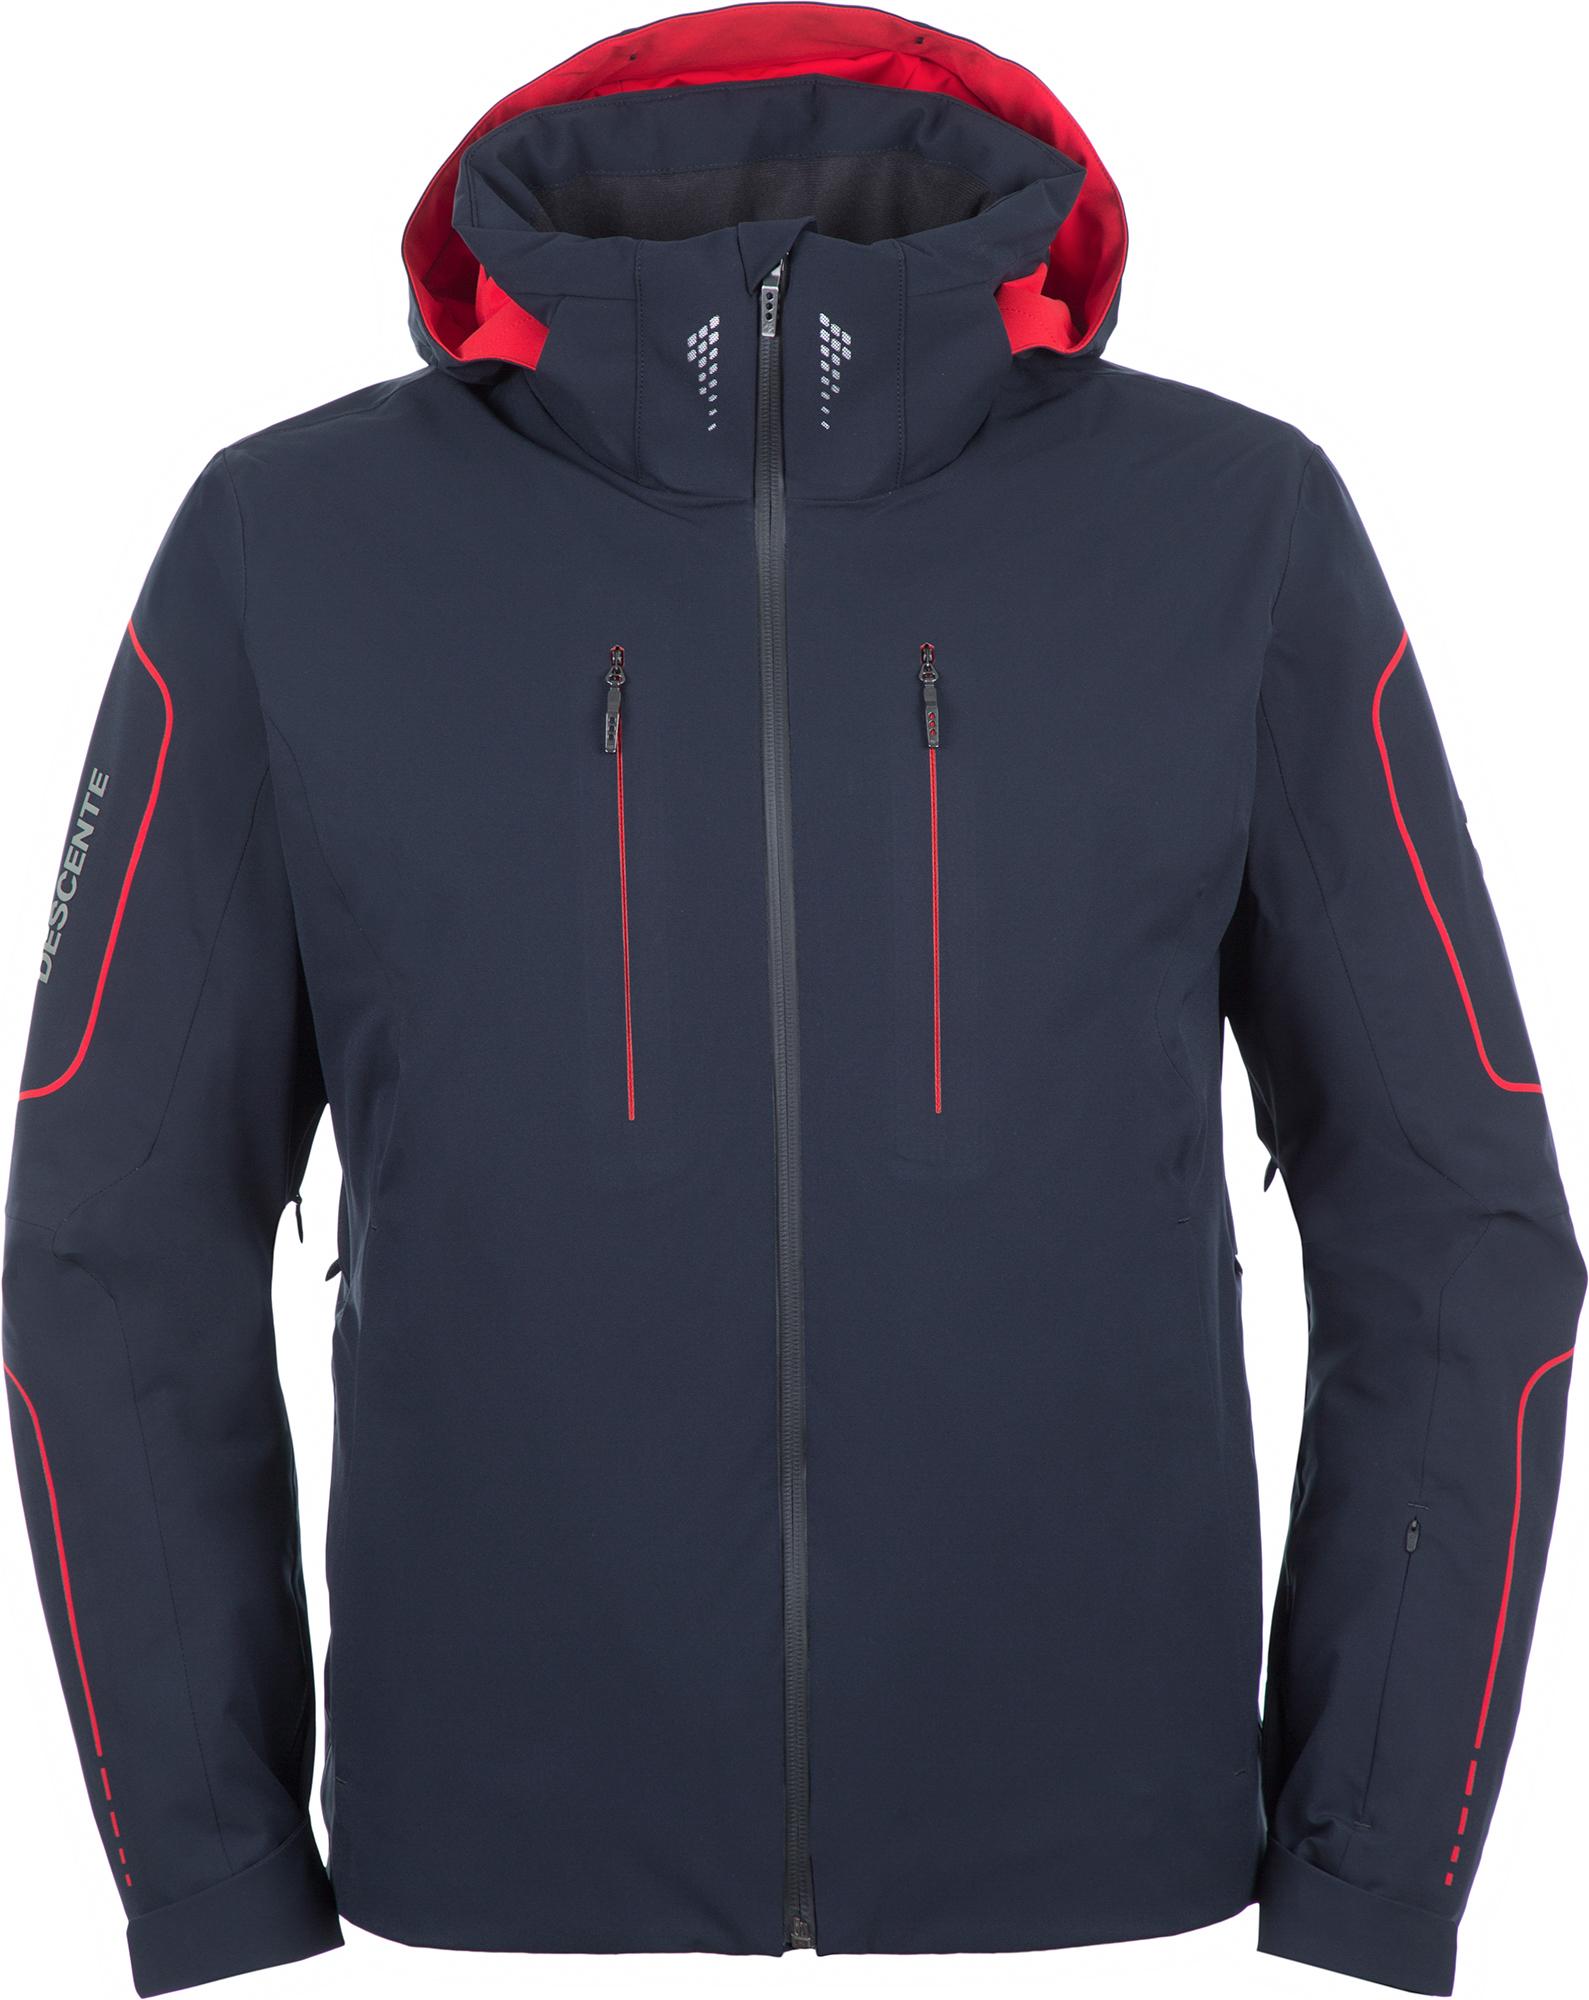 Descente Куртка утепленная мужская Isak, размер 52